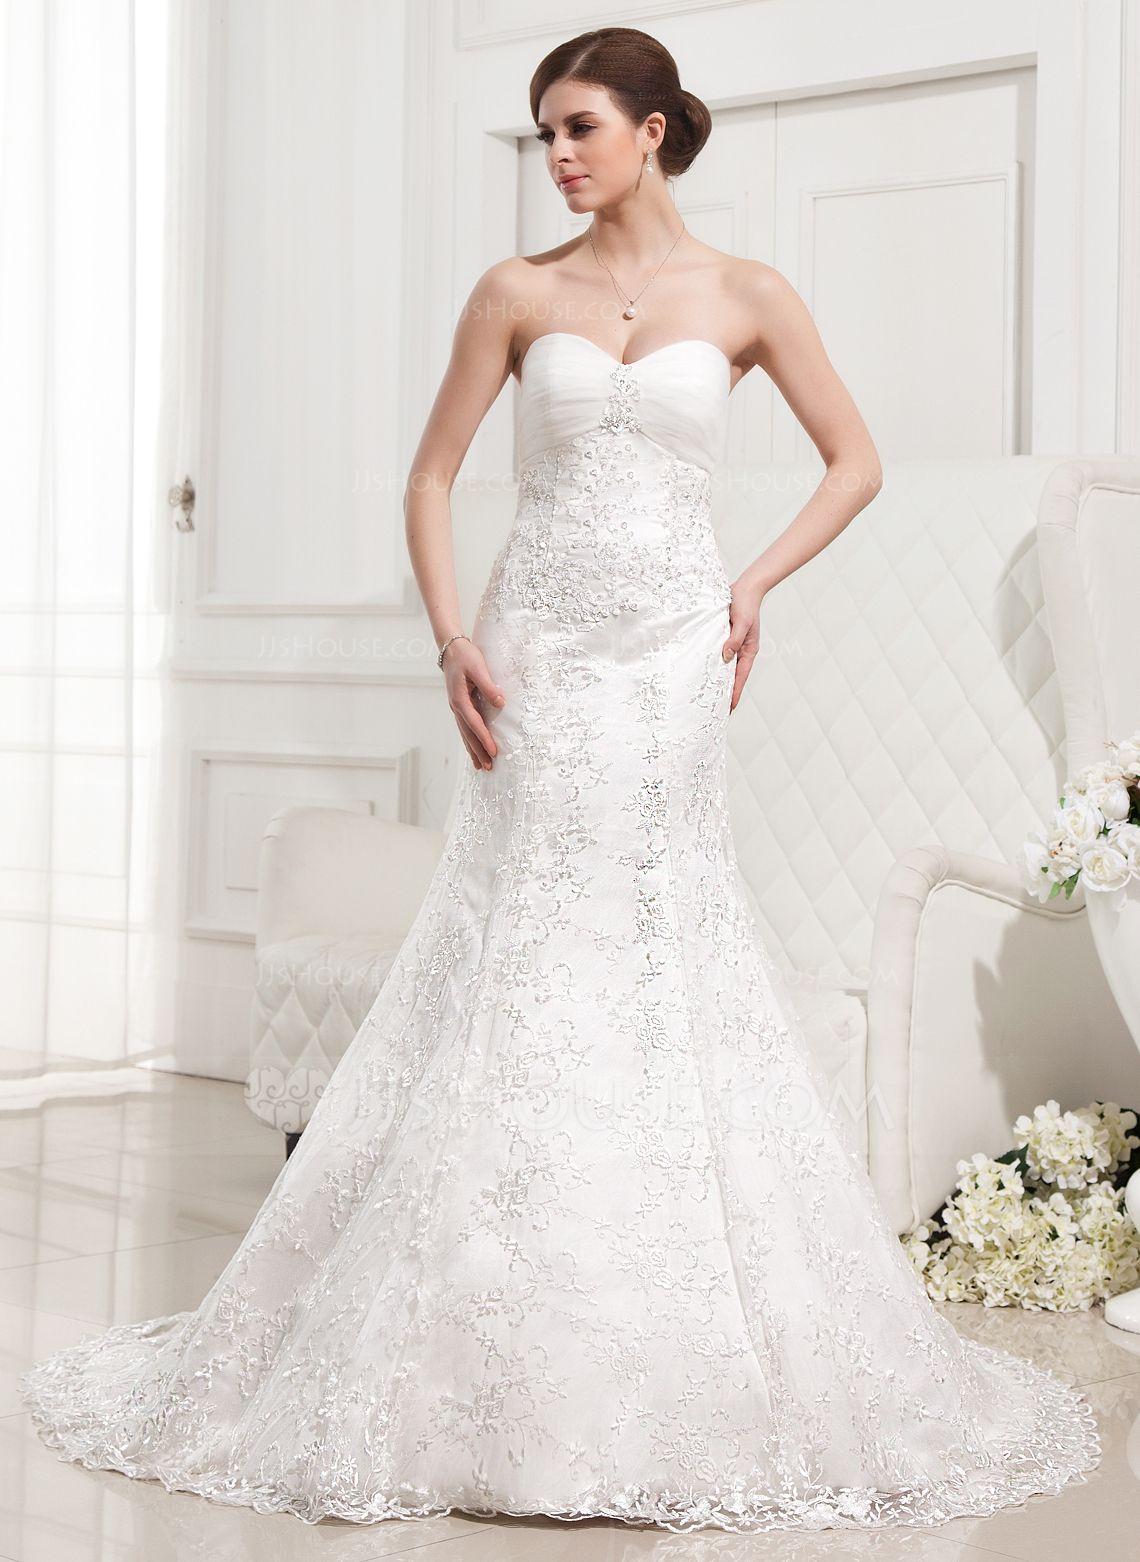 Cheap Wedding Dresses Under 100.Cheap Wedding Dresses Under 100 Mermaid